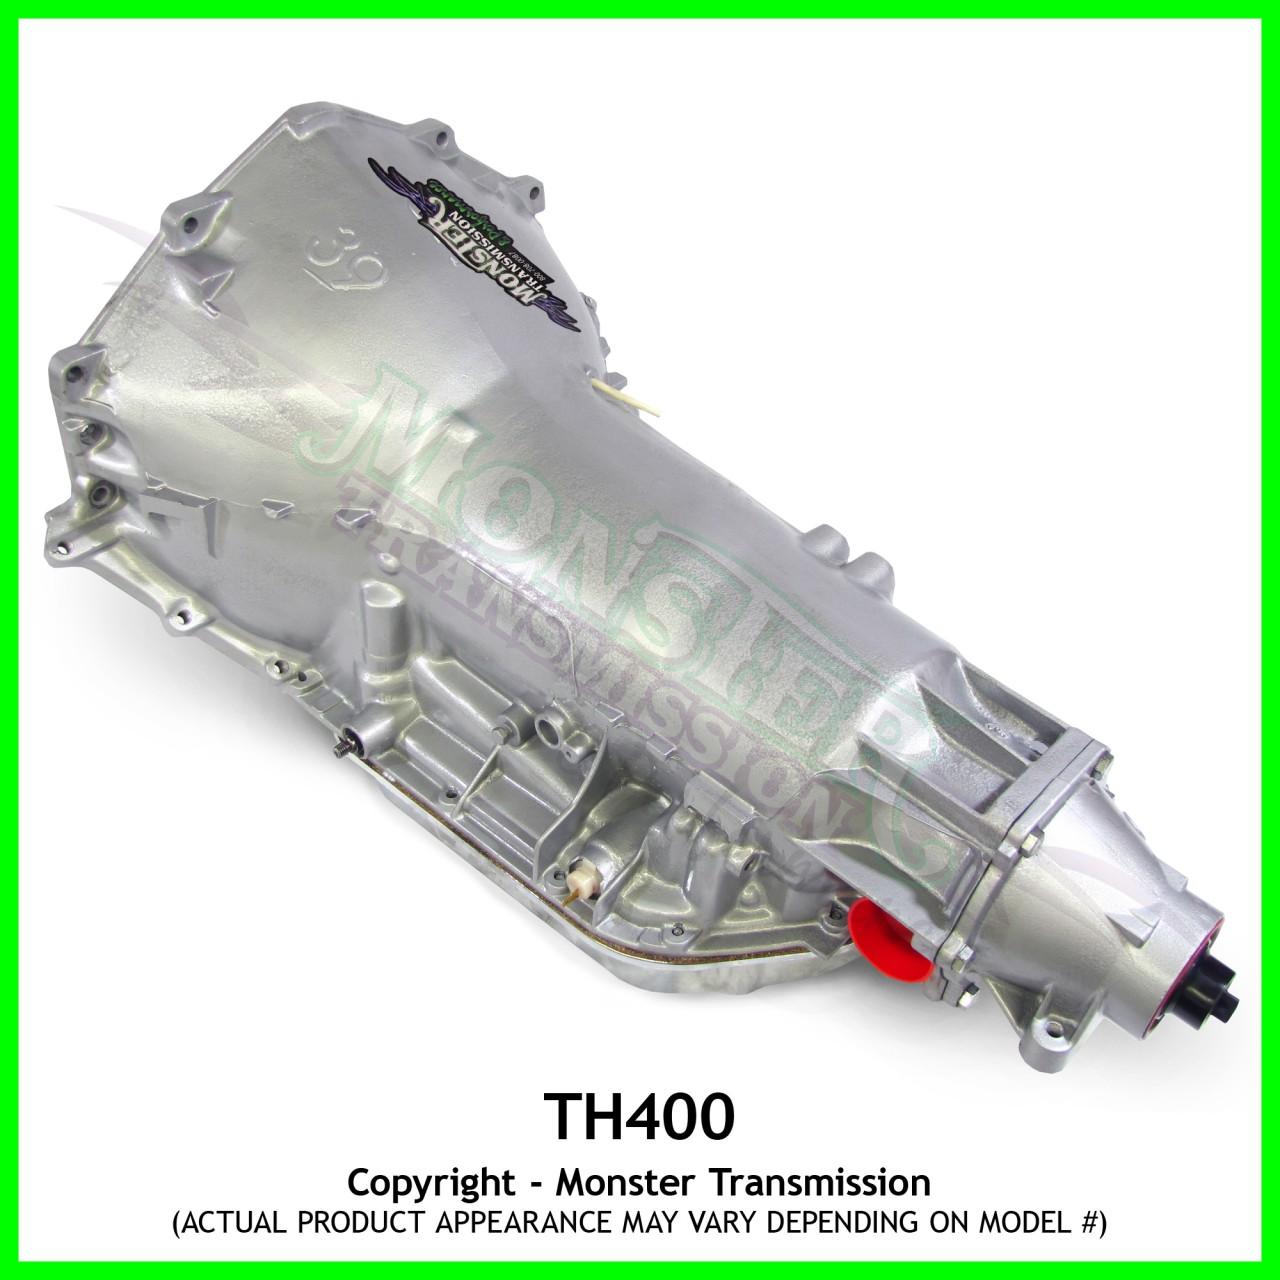 th400 transmission diagram 2 way switch wire turbo 350 vs 400 identification autos post